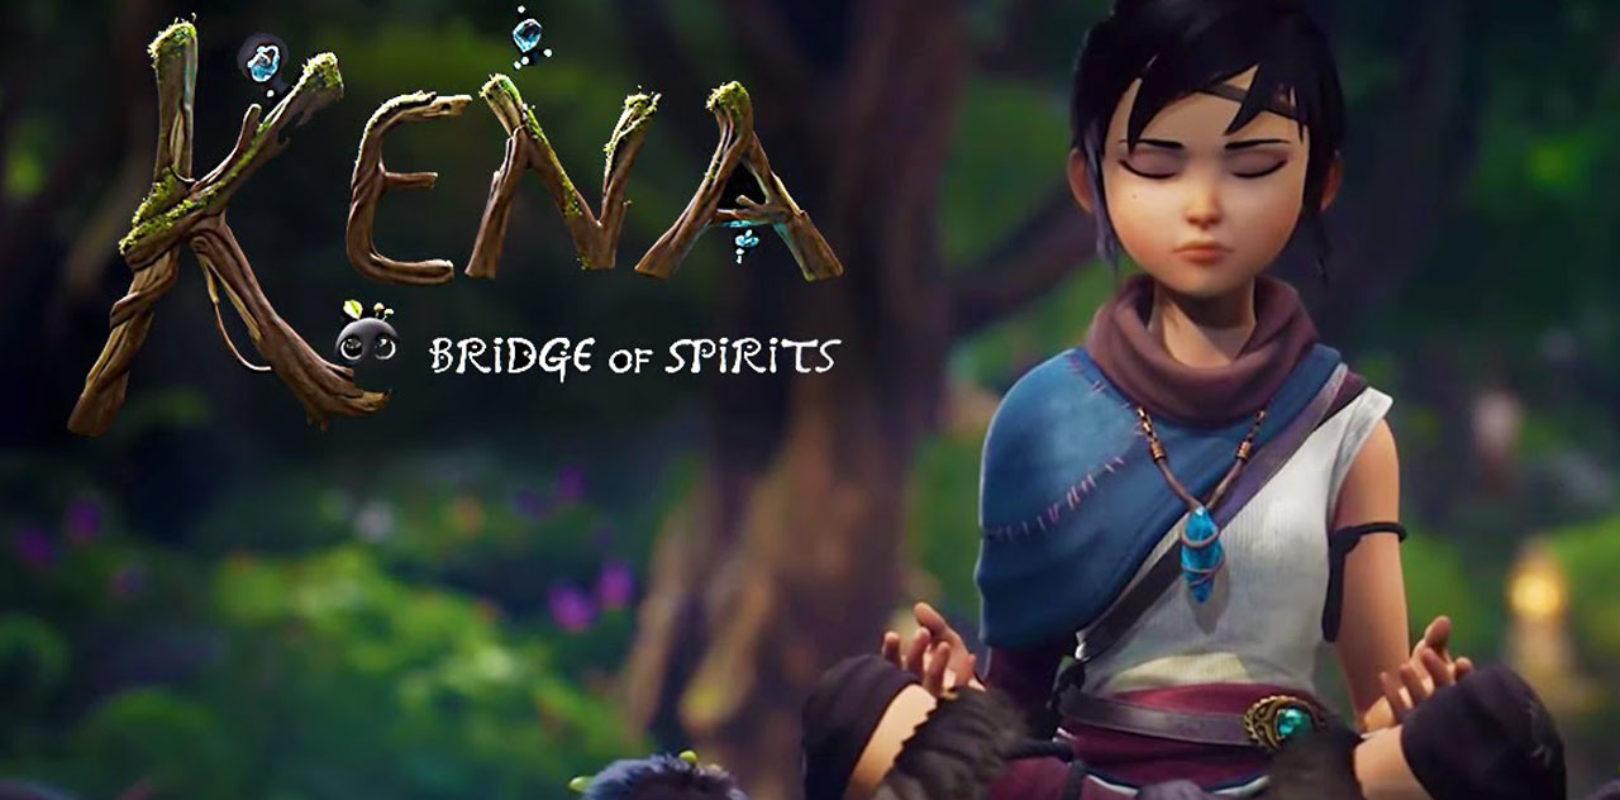 Kena: Bridge of Spirits ditunda hingga 2021 - Gameindo